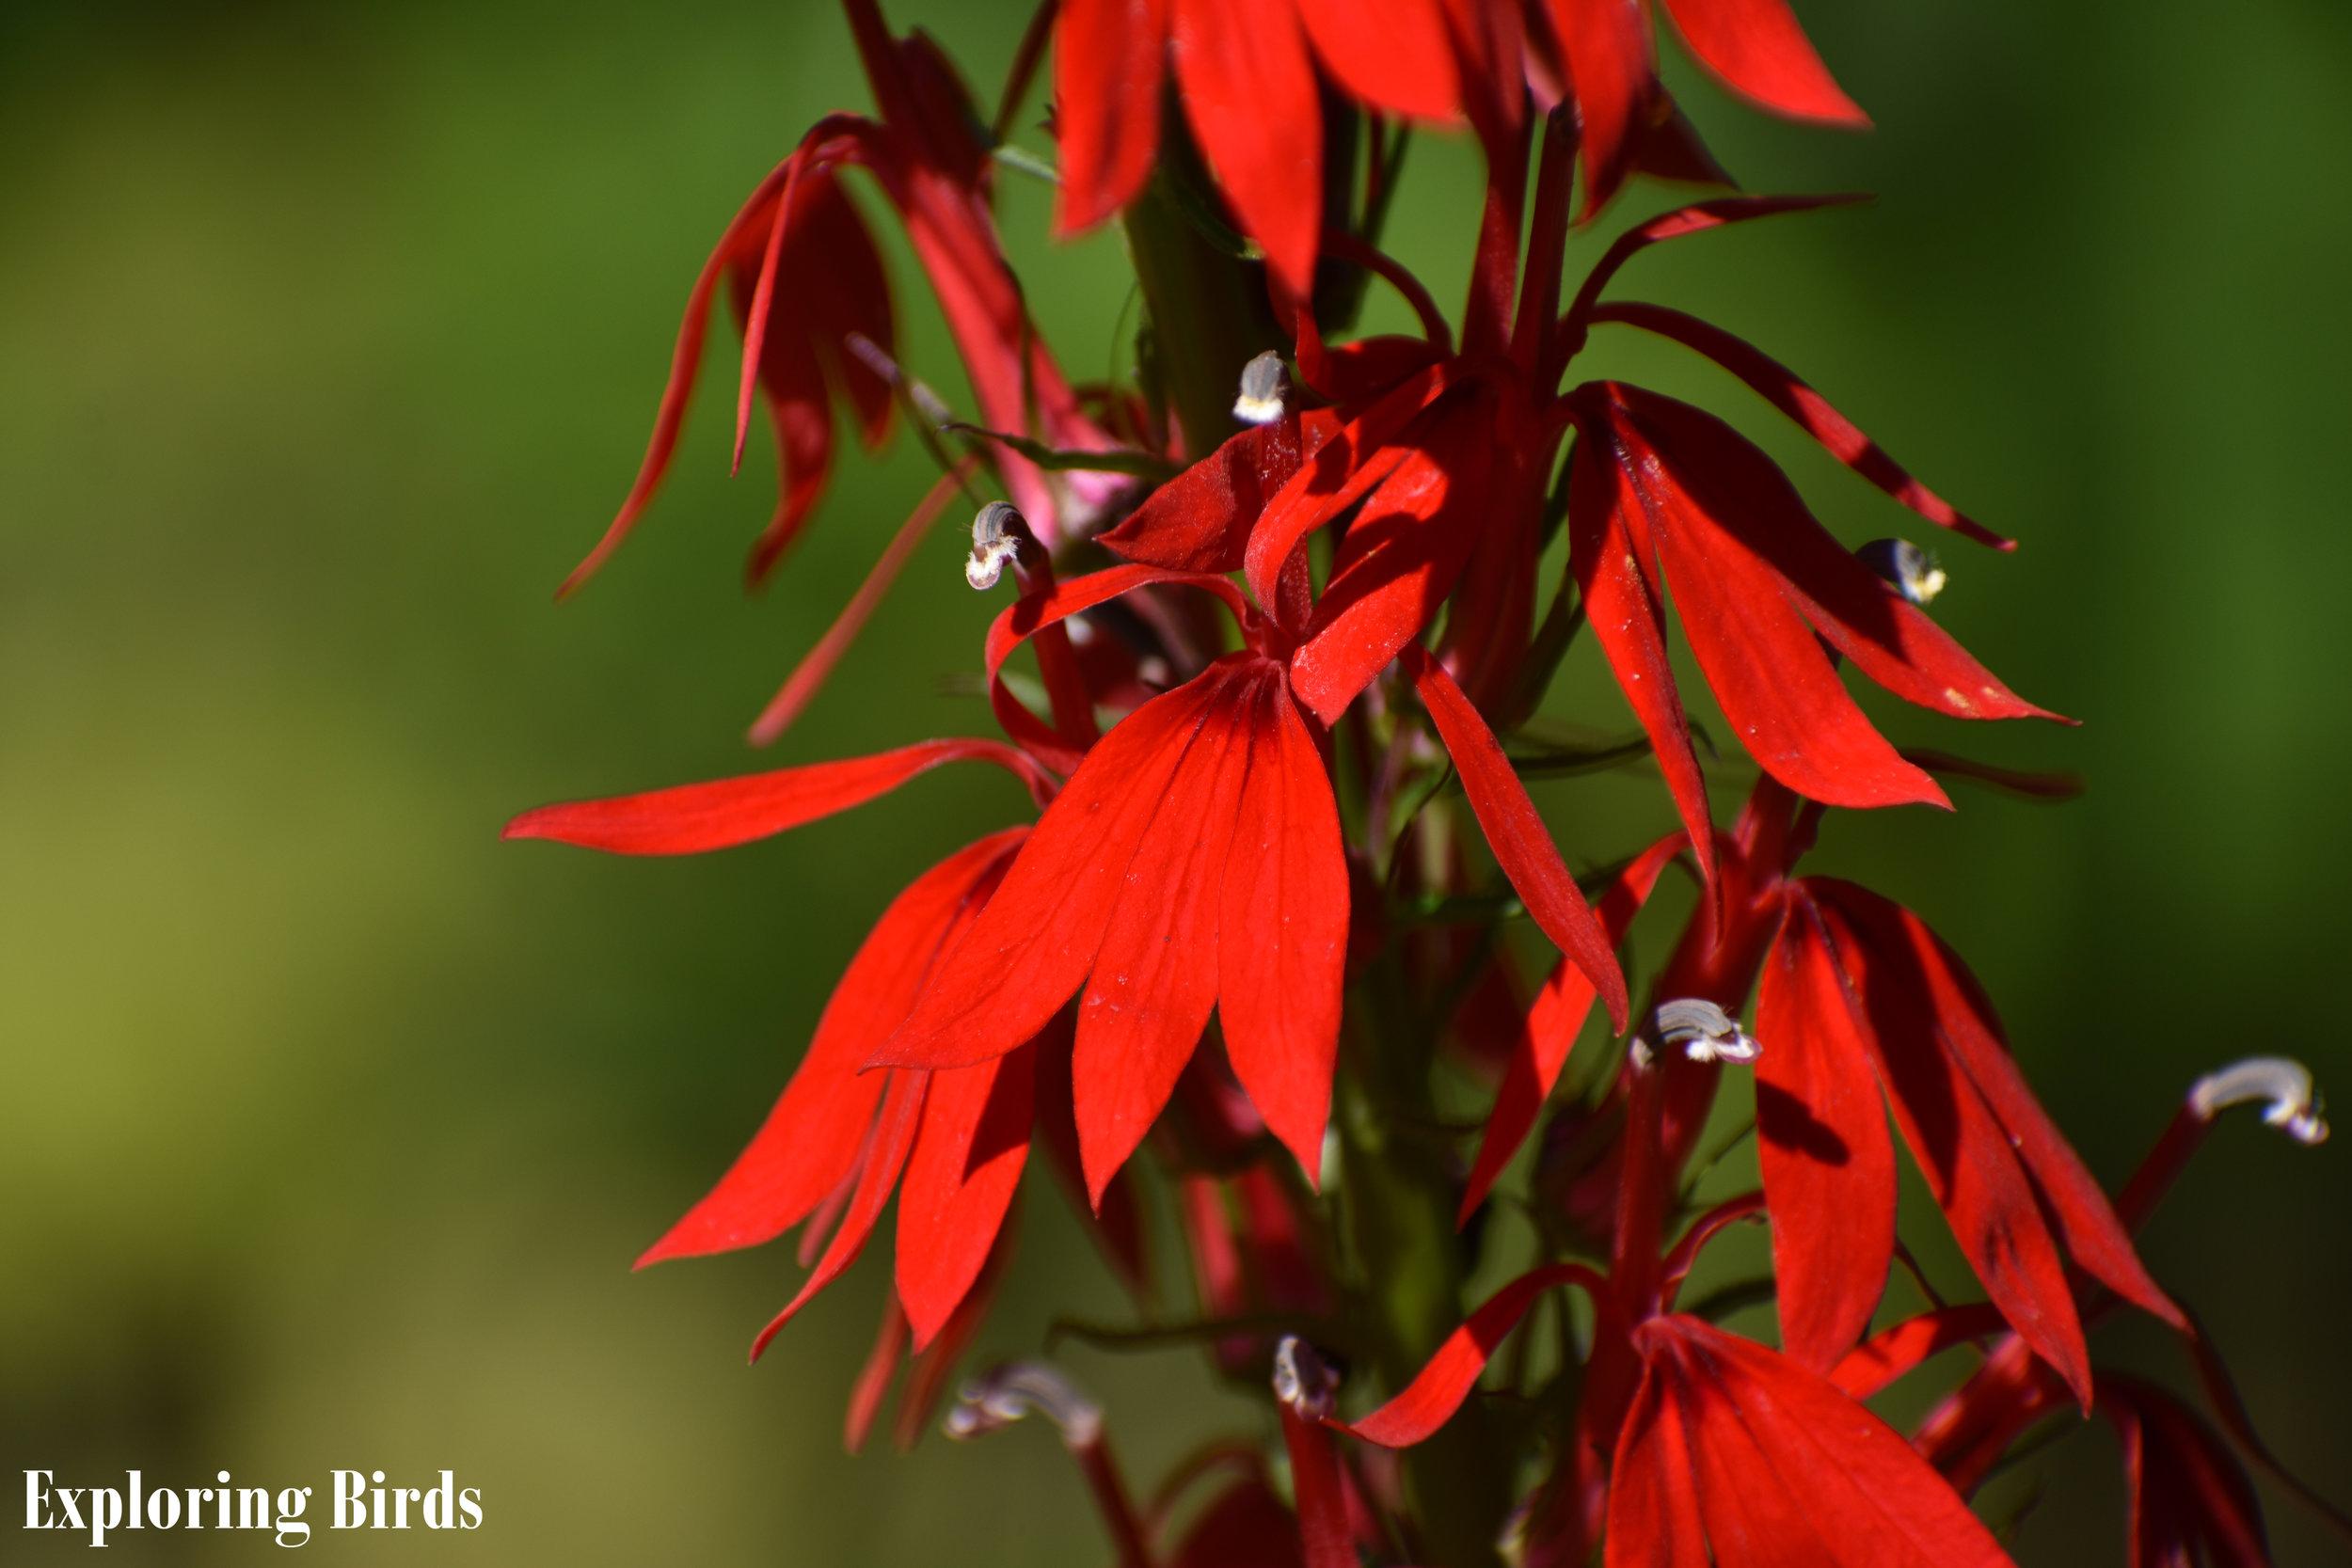 Cardinal Flower attracts hummingbirds